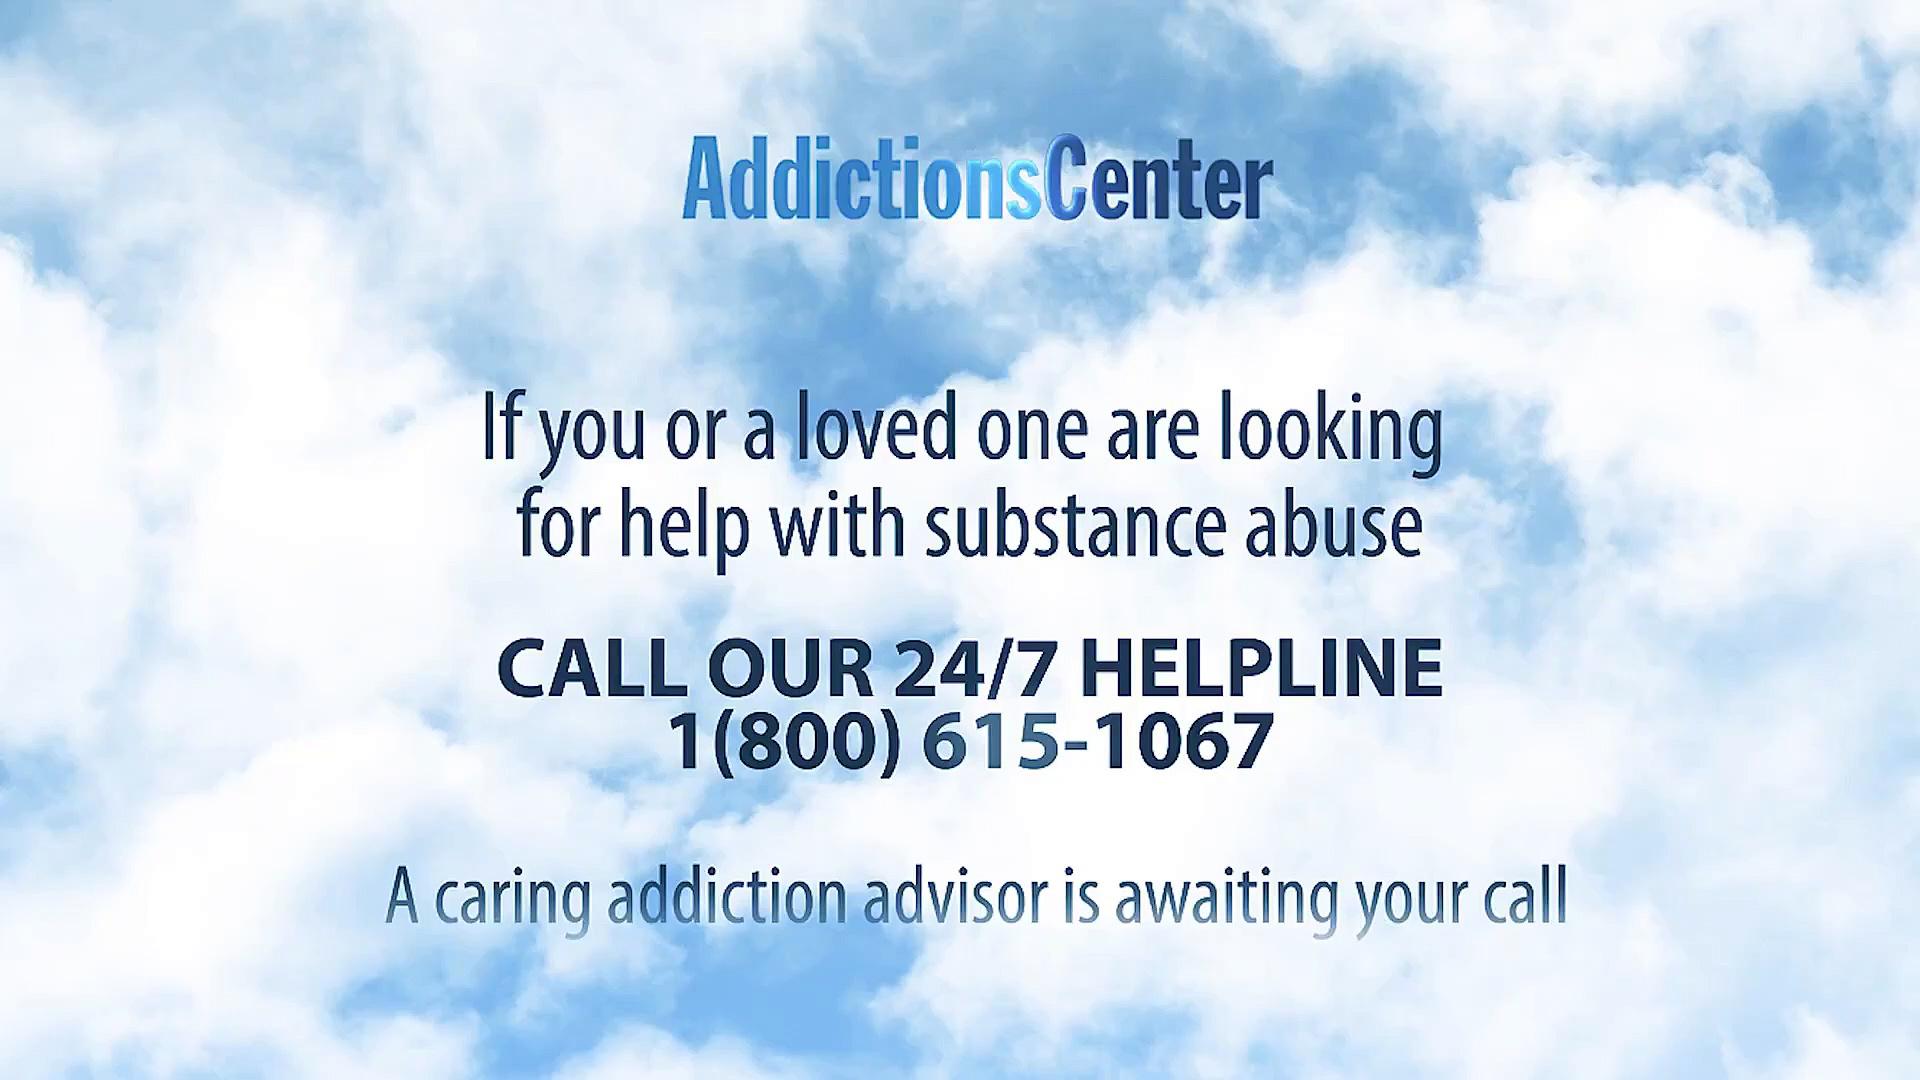 Drinking Problem Rehab – 24/7 Helpline Call 1(800) 615-1067 [WxqAPmiOC2o]